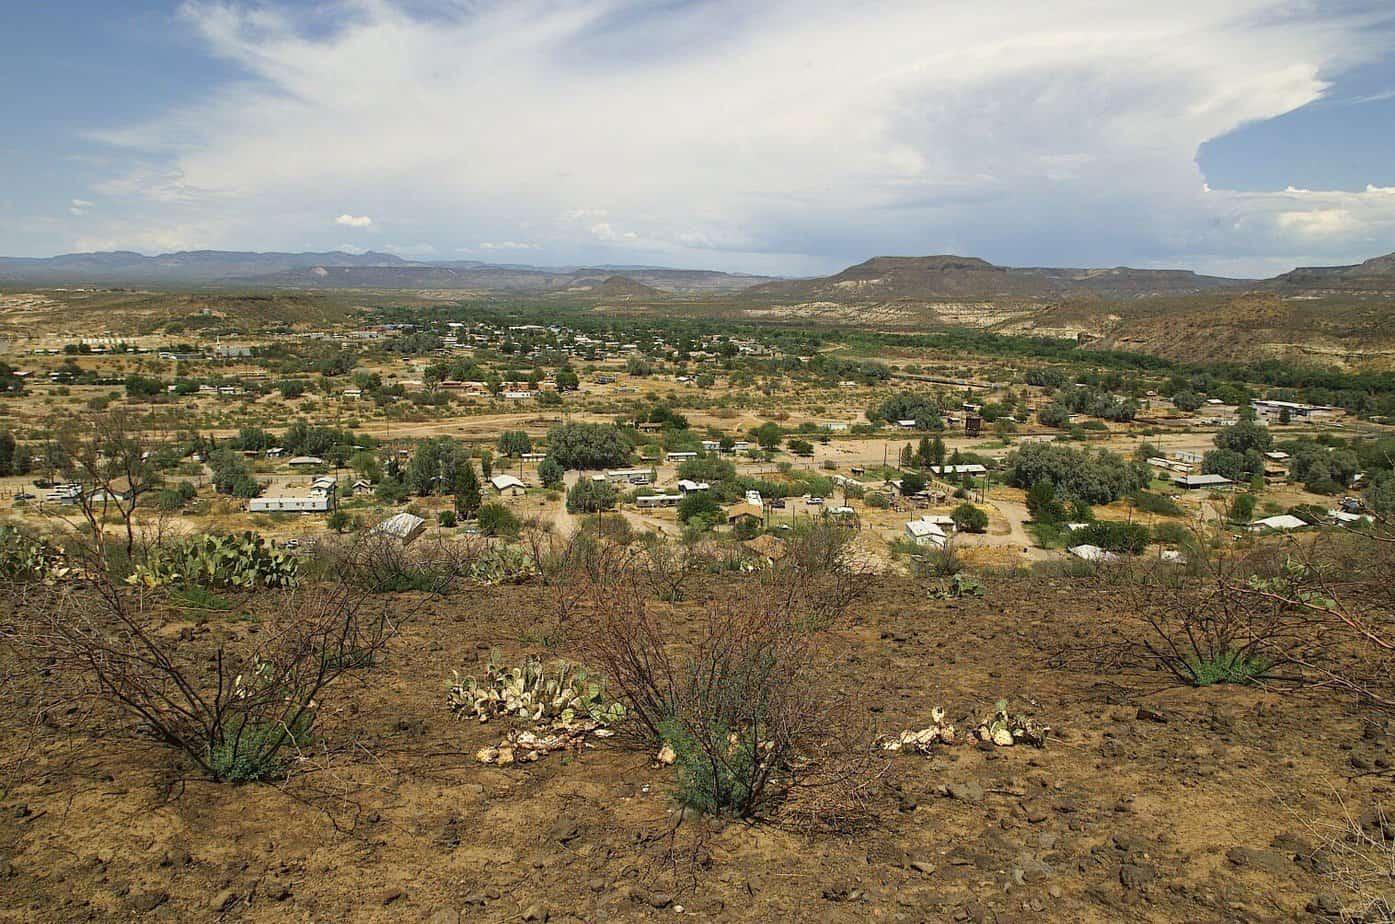 san carlos reservation